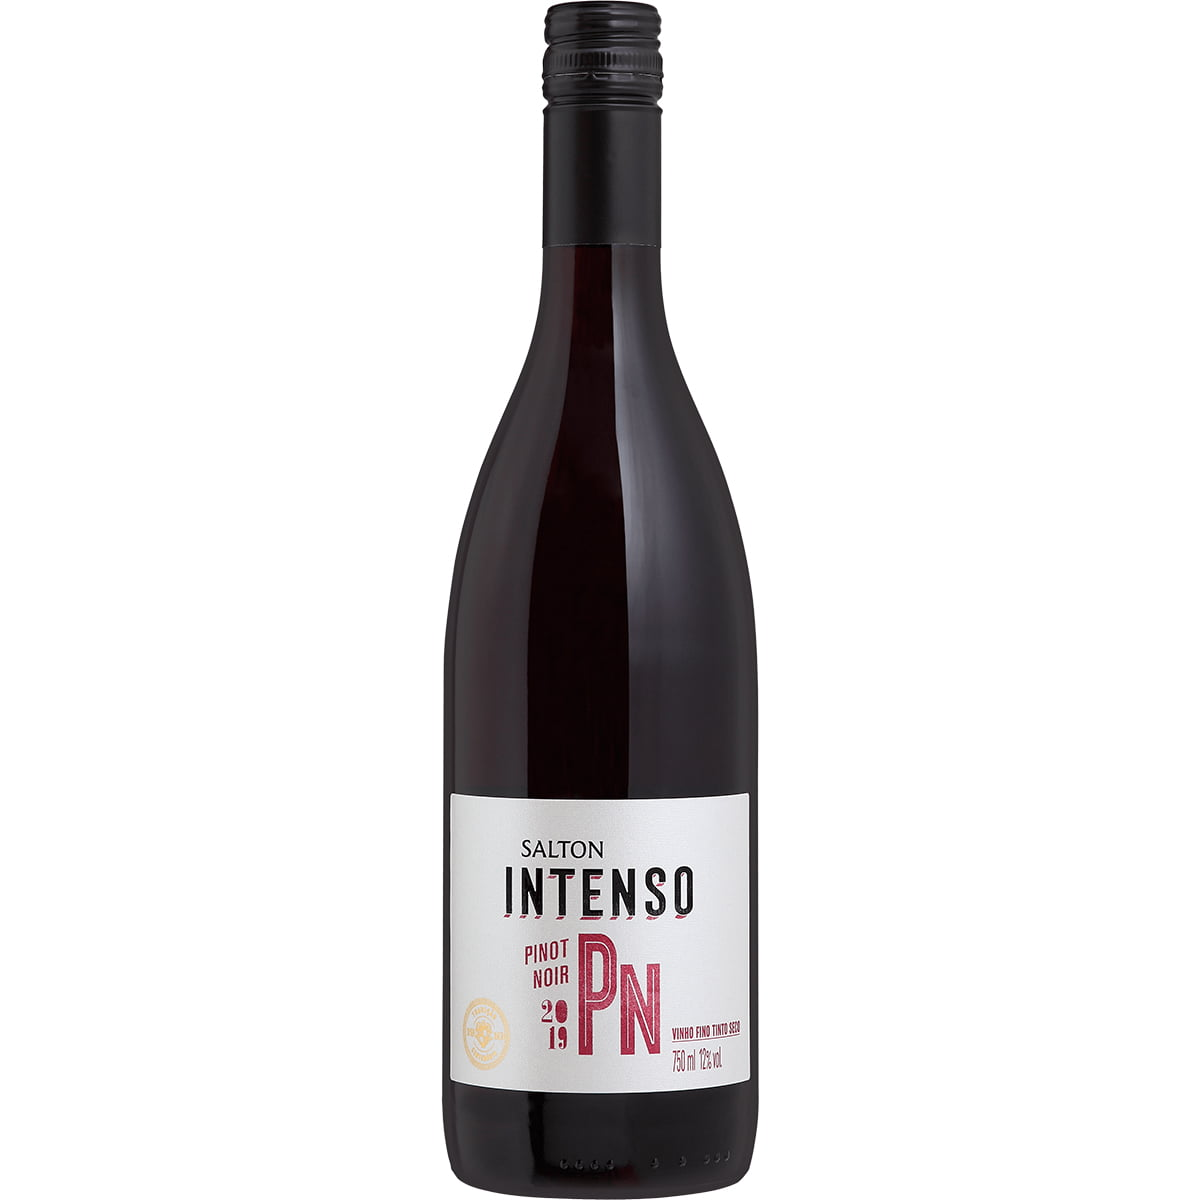 Vinho Salton Intenso Pinot Noir Tinto Seco 750ml